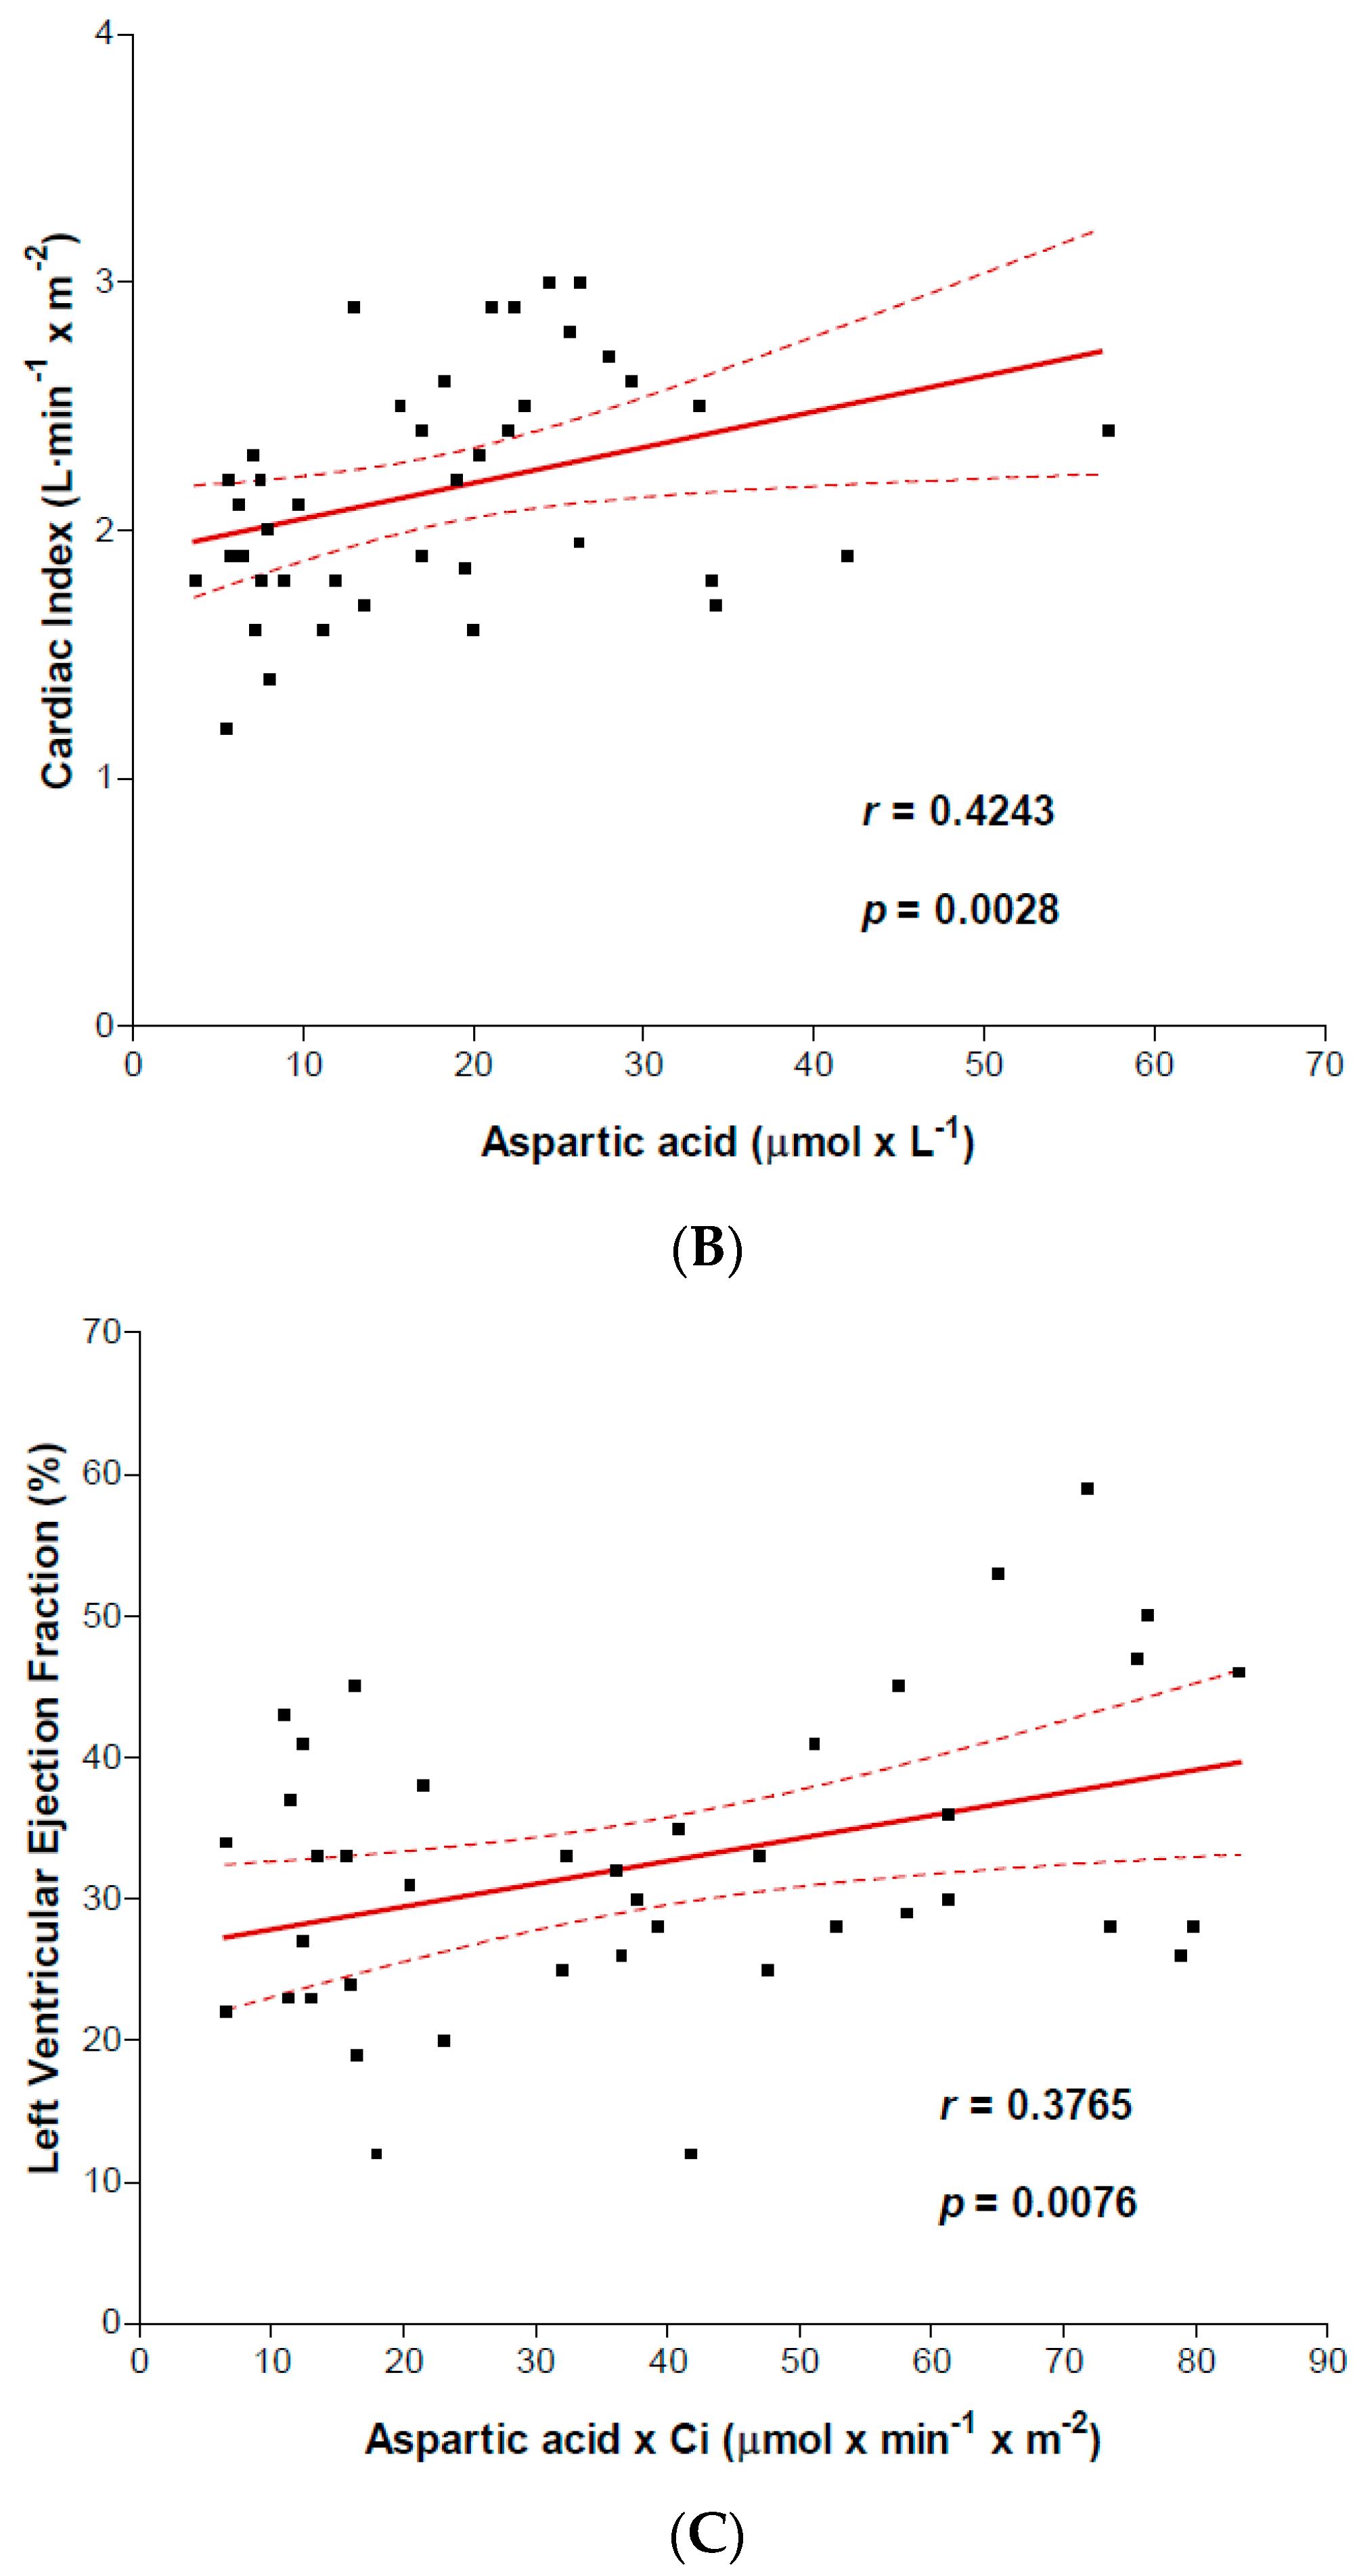 relationship between aspartic acid and asparagine benefits